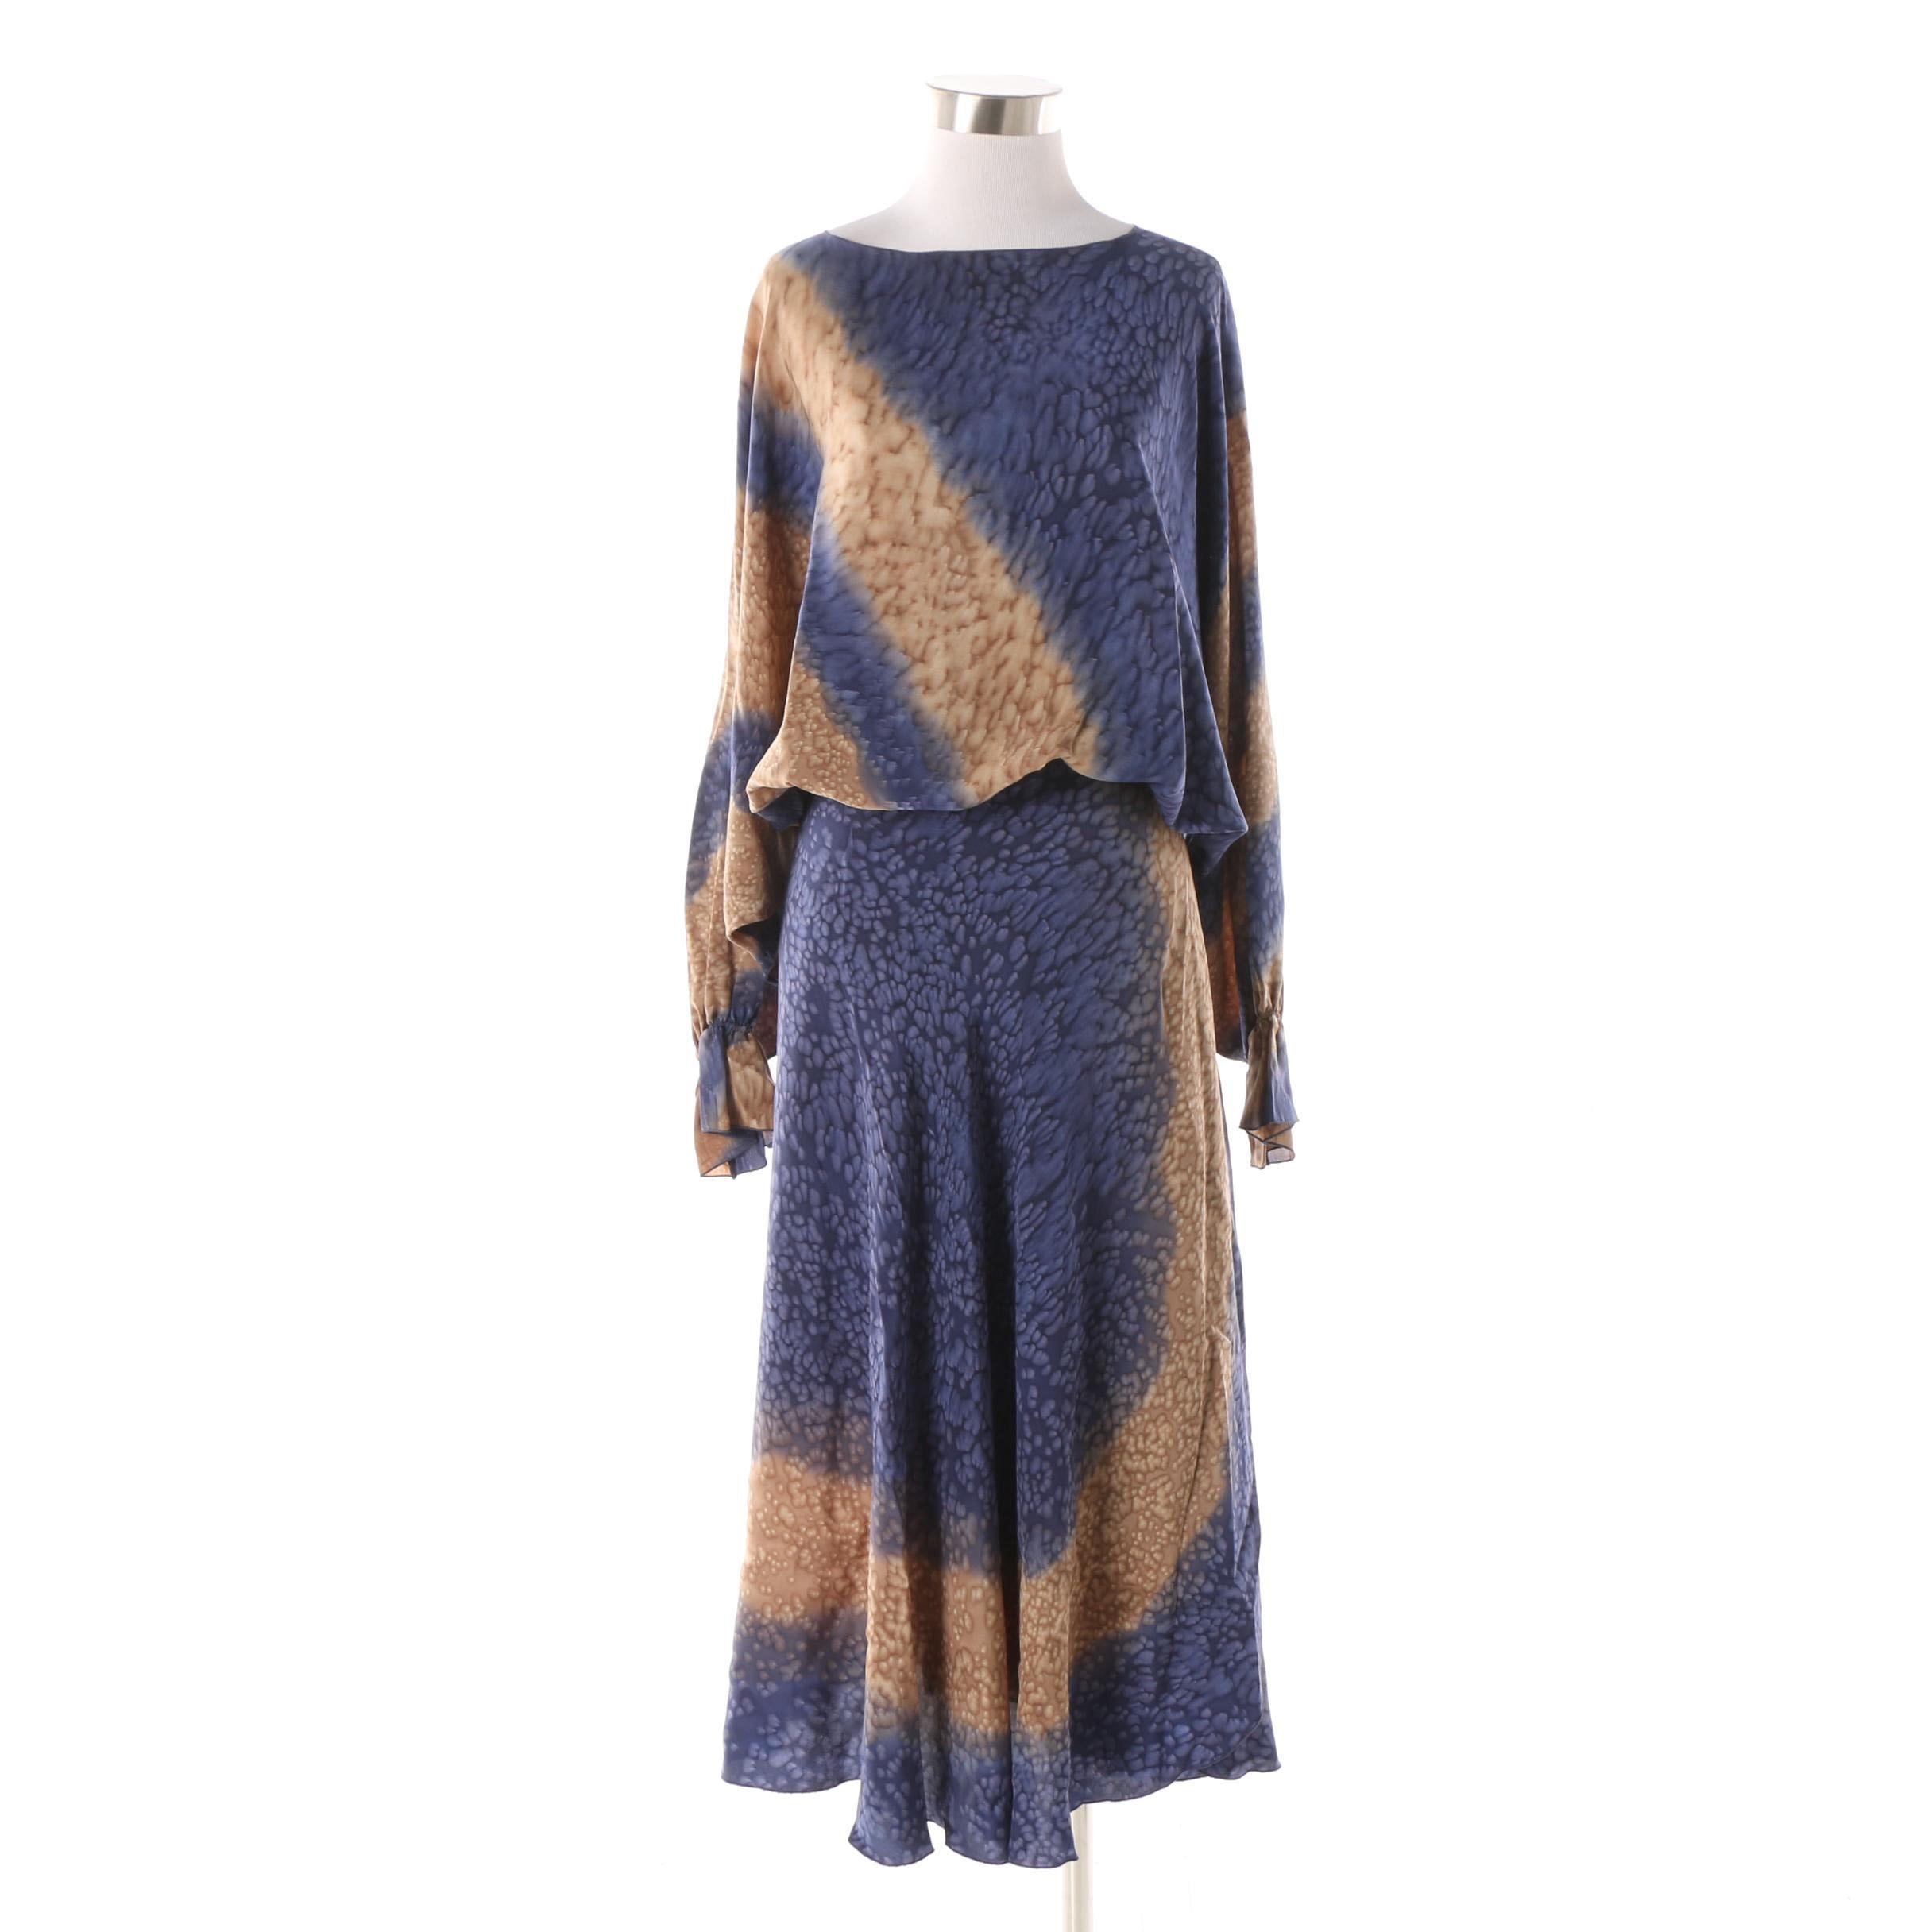 Vintage Khorshed for Sansappelle Hand-Painted Silk Separates